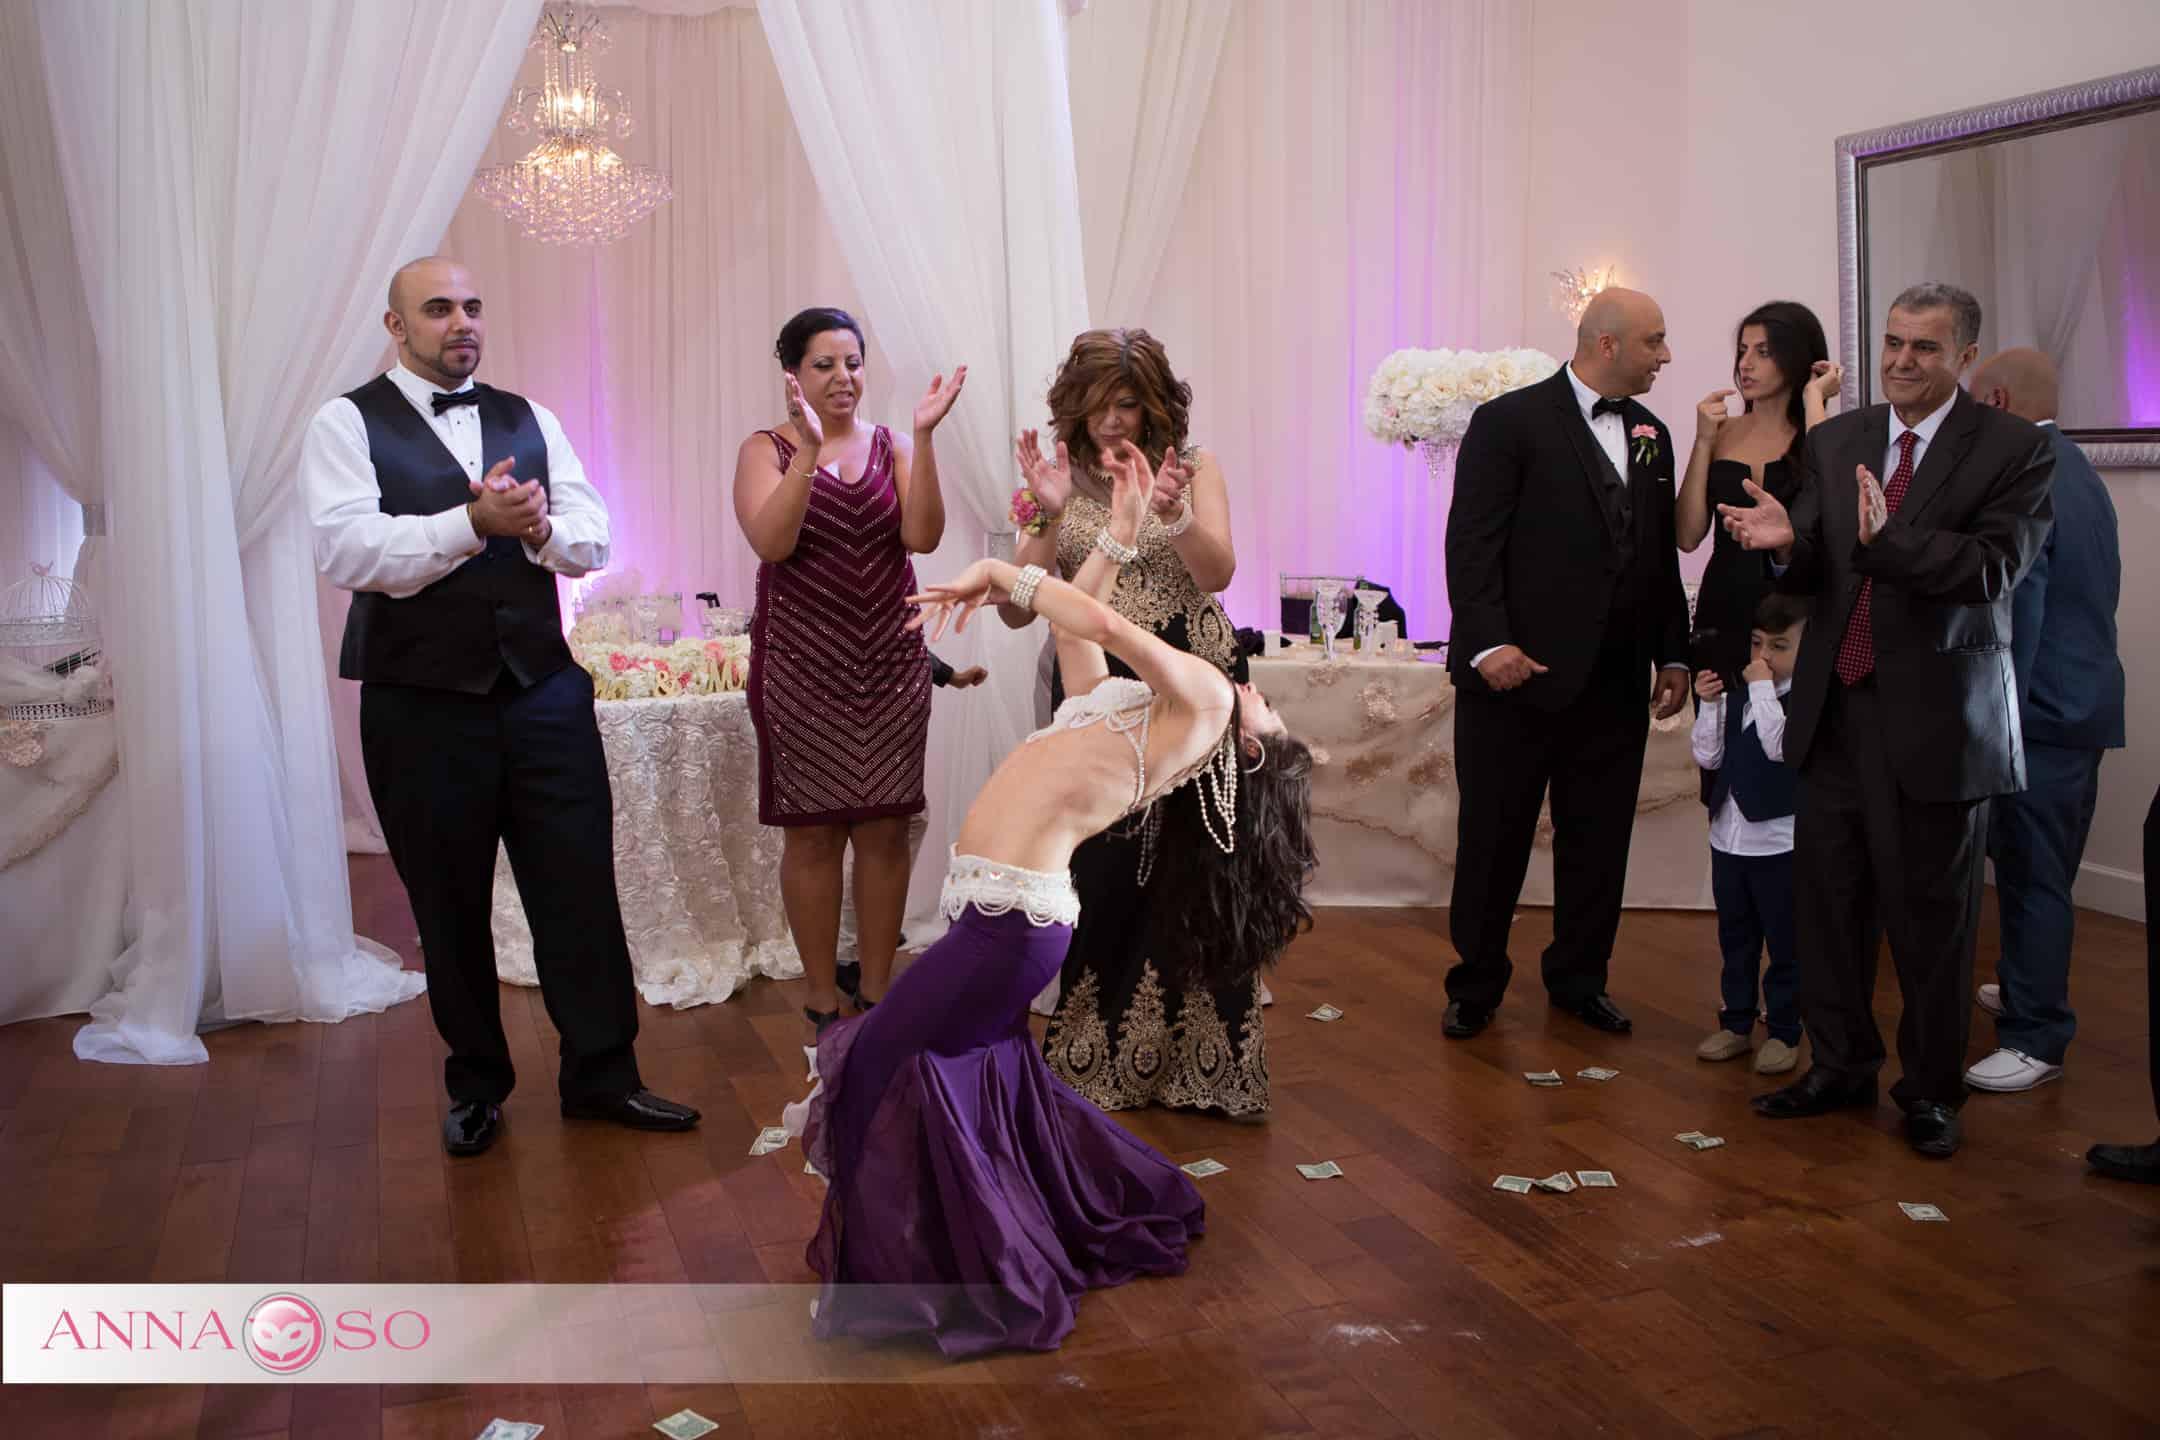 Carrara Nour (belly dancer Orlando) performs at an Egyptian wedding at Crystal Ballroom at Veranda MetroWest. Photography by Anna So